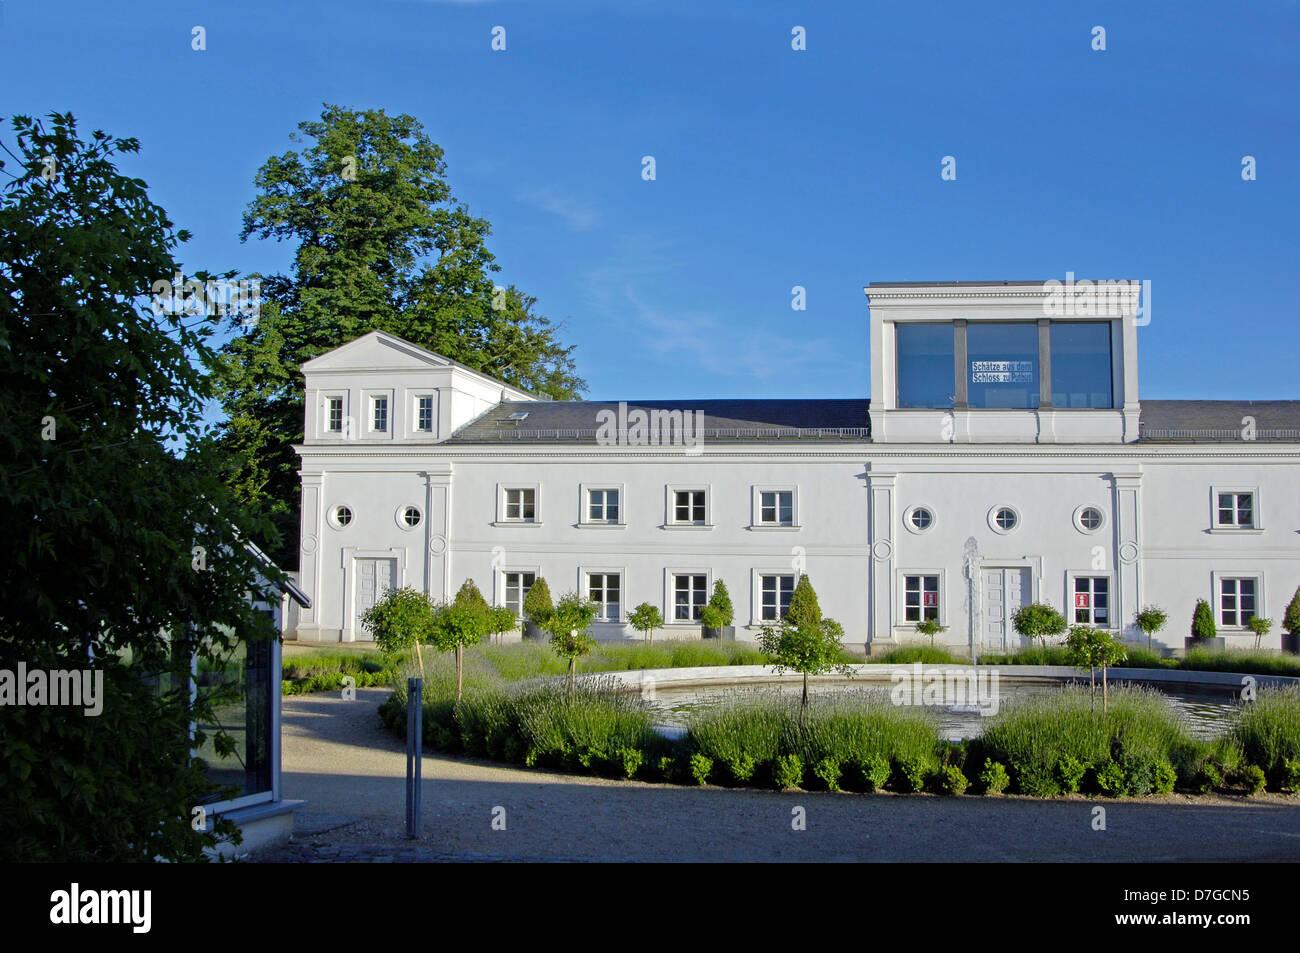 Germany, Mecklenburg-West Pomerania, island Rügen, Putbus, castle park, orangery - Stock Image